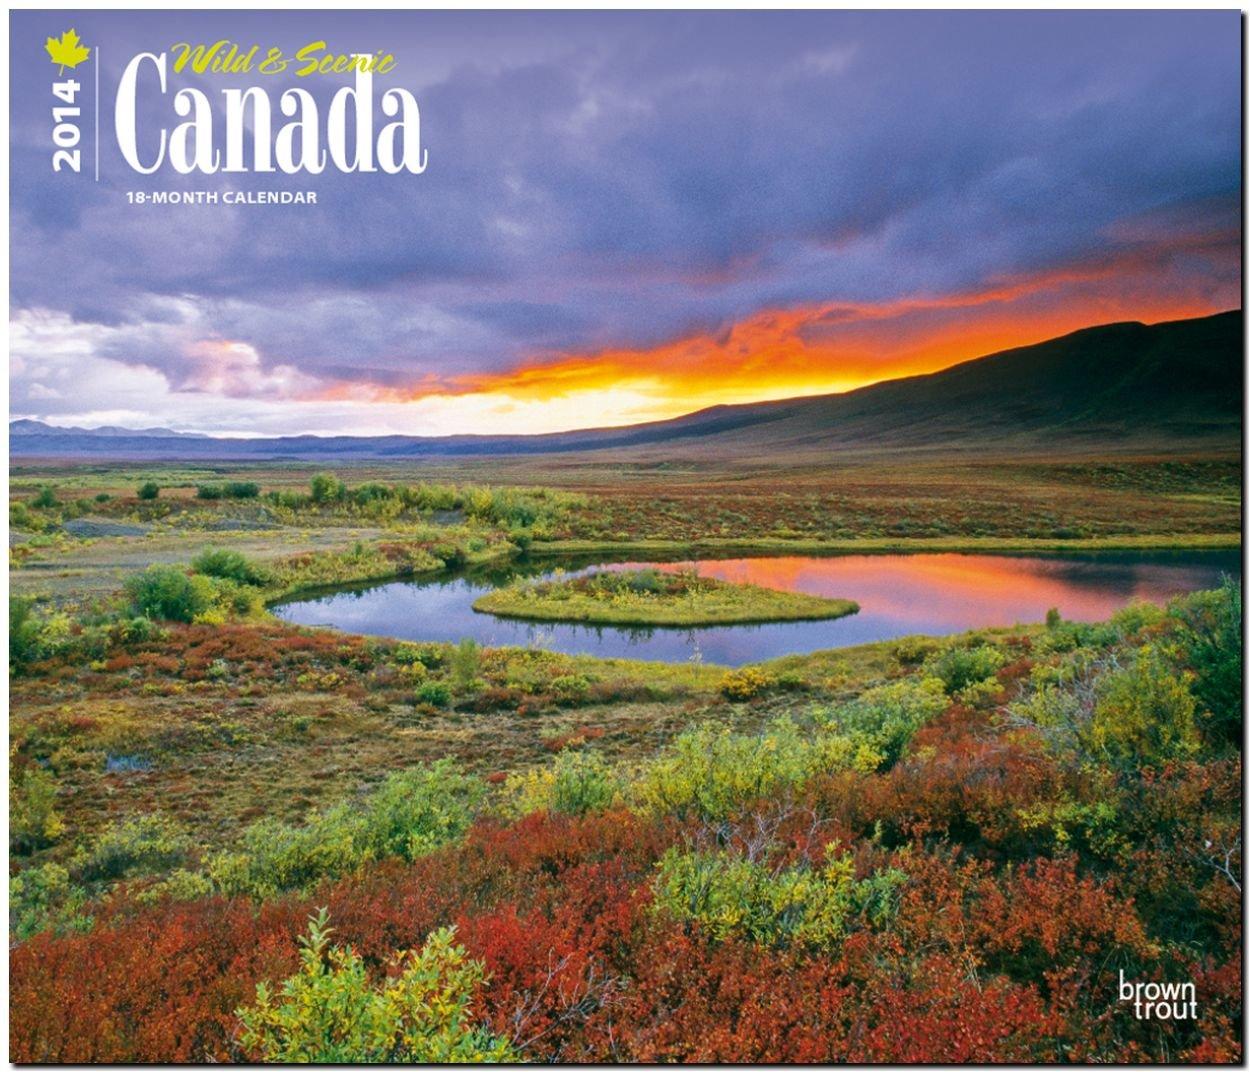 Canada - Wild & Scenic 2014 - Kanada: Original BrownTrout-Kalender - Deluxe [Mehrsprachig] [Kalender]